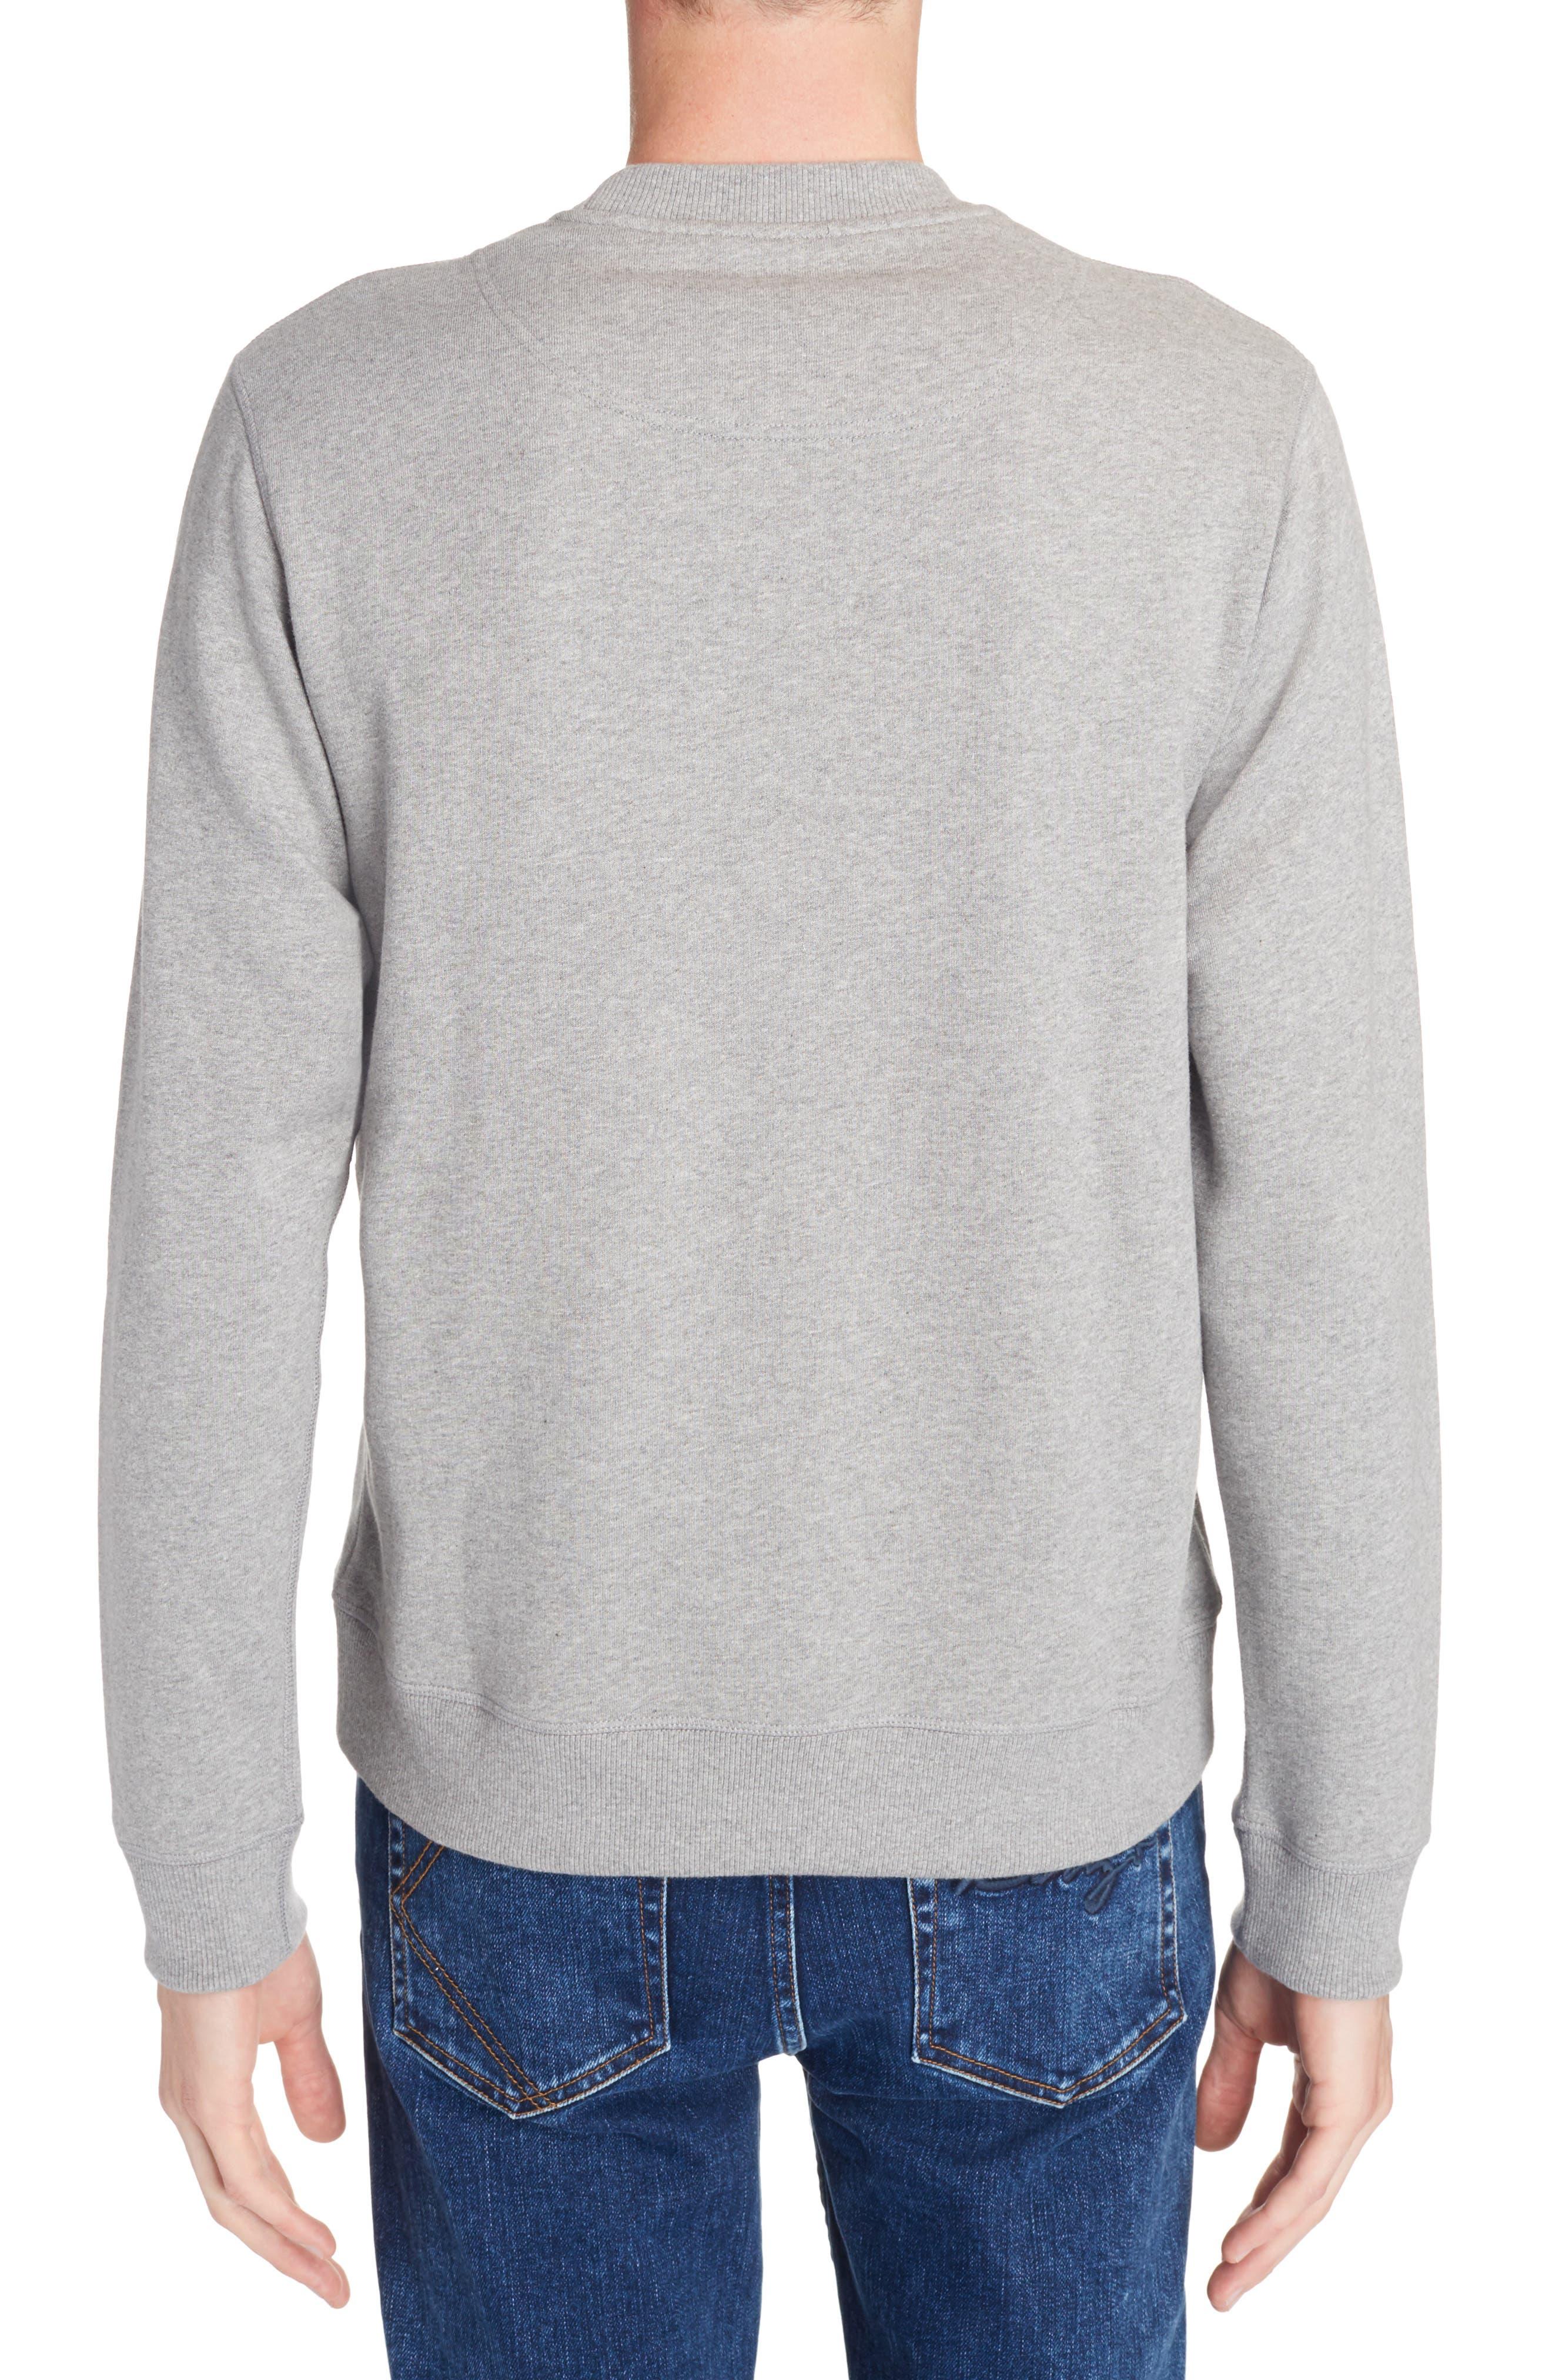 Rainbow Tiger Crewneck Sweatshirt,                             Alternate thumbnail 2, color,                             051